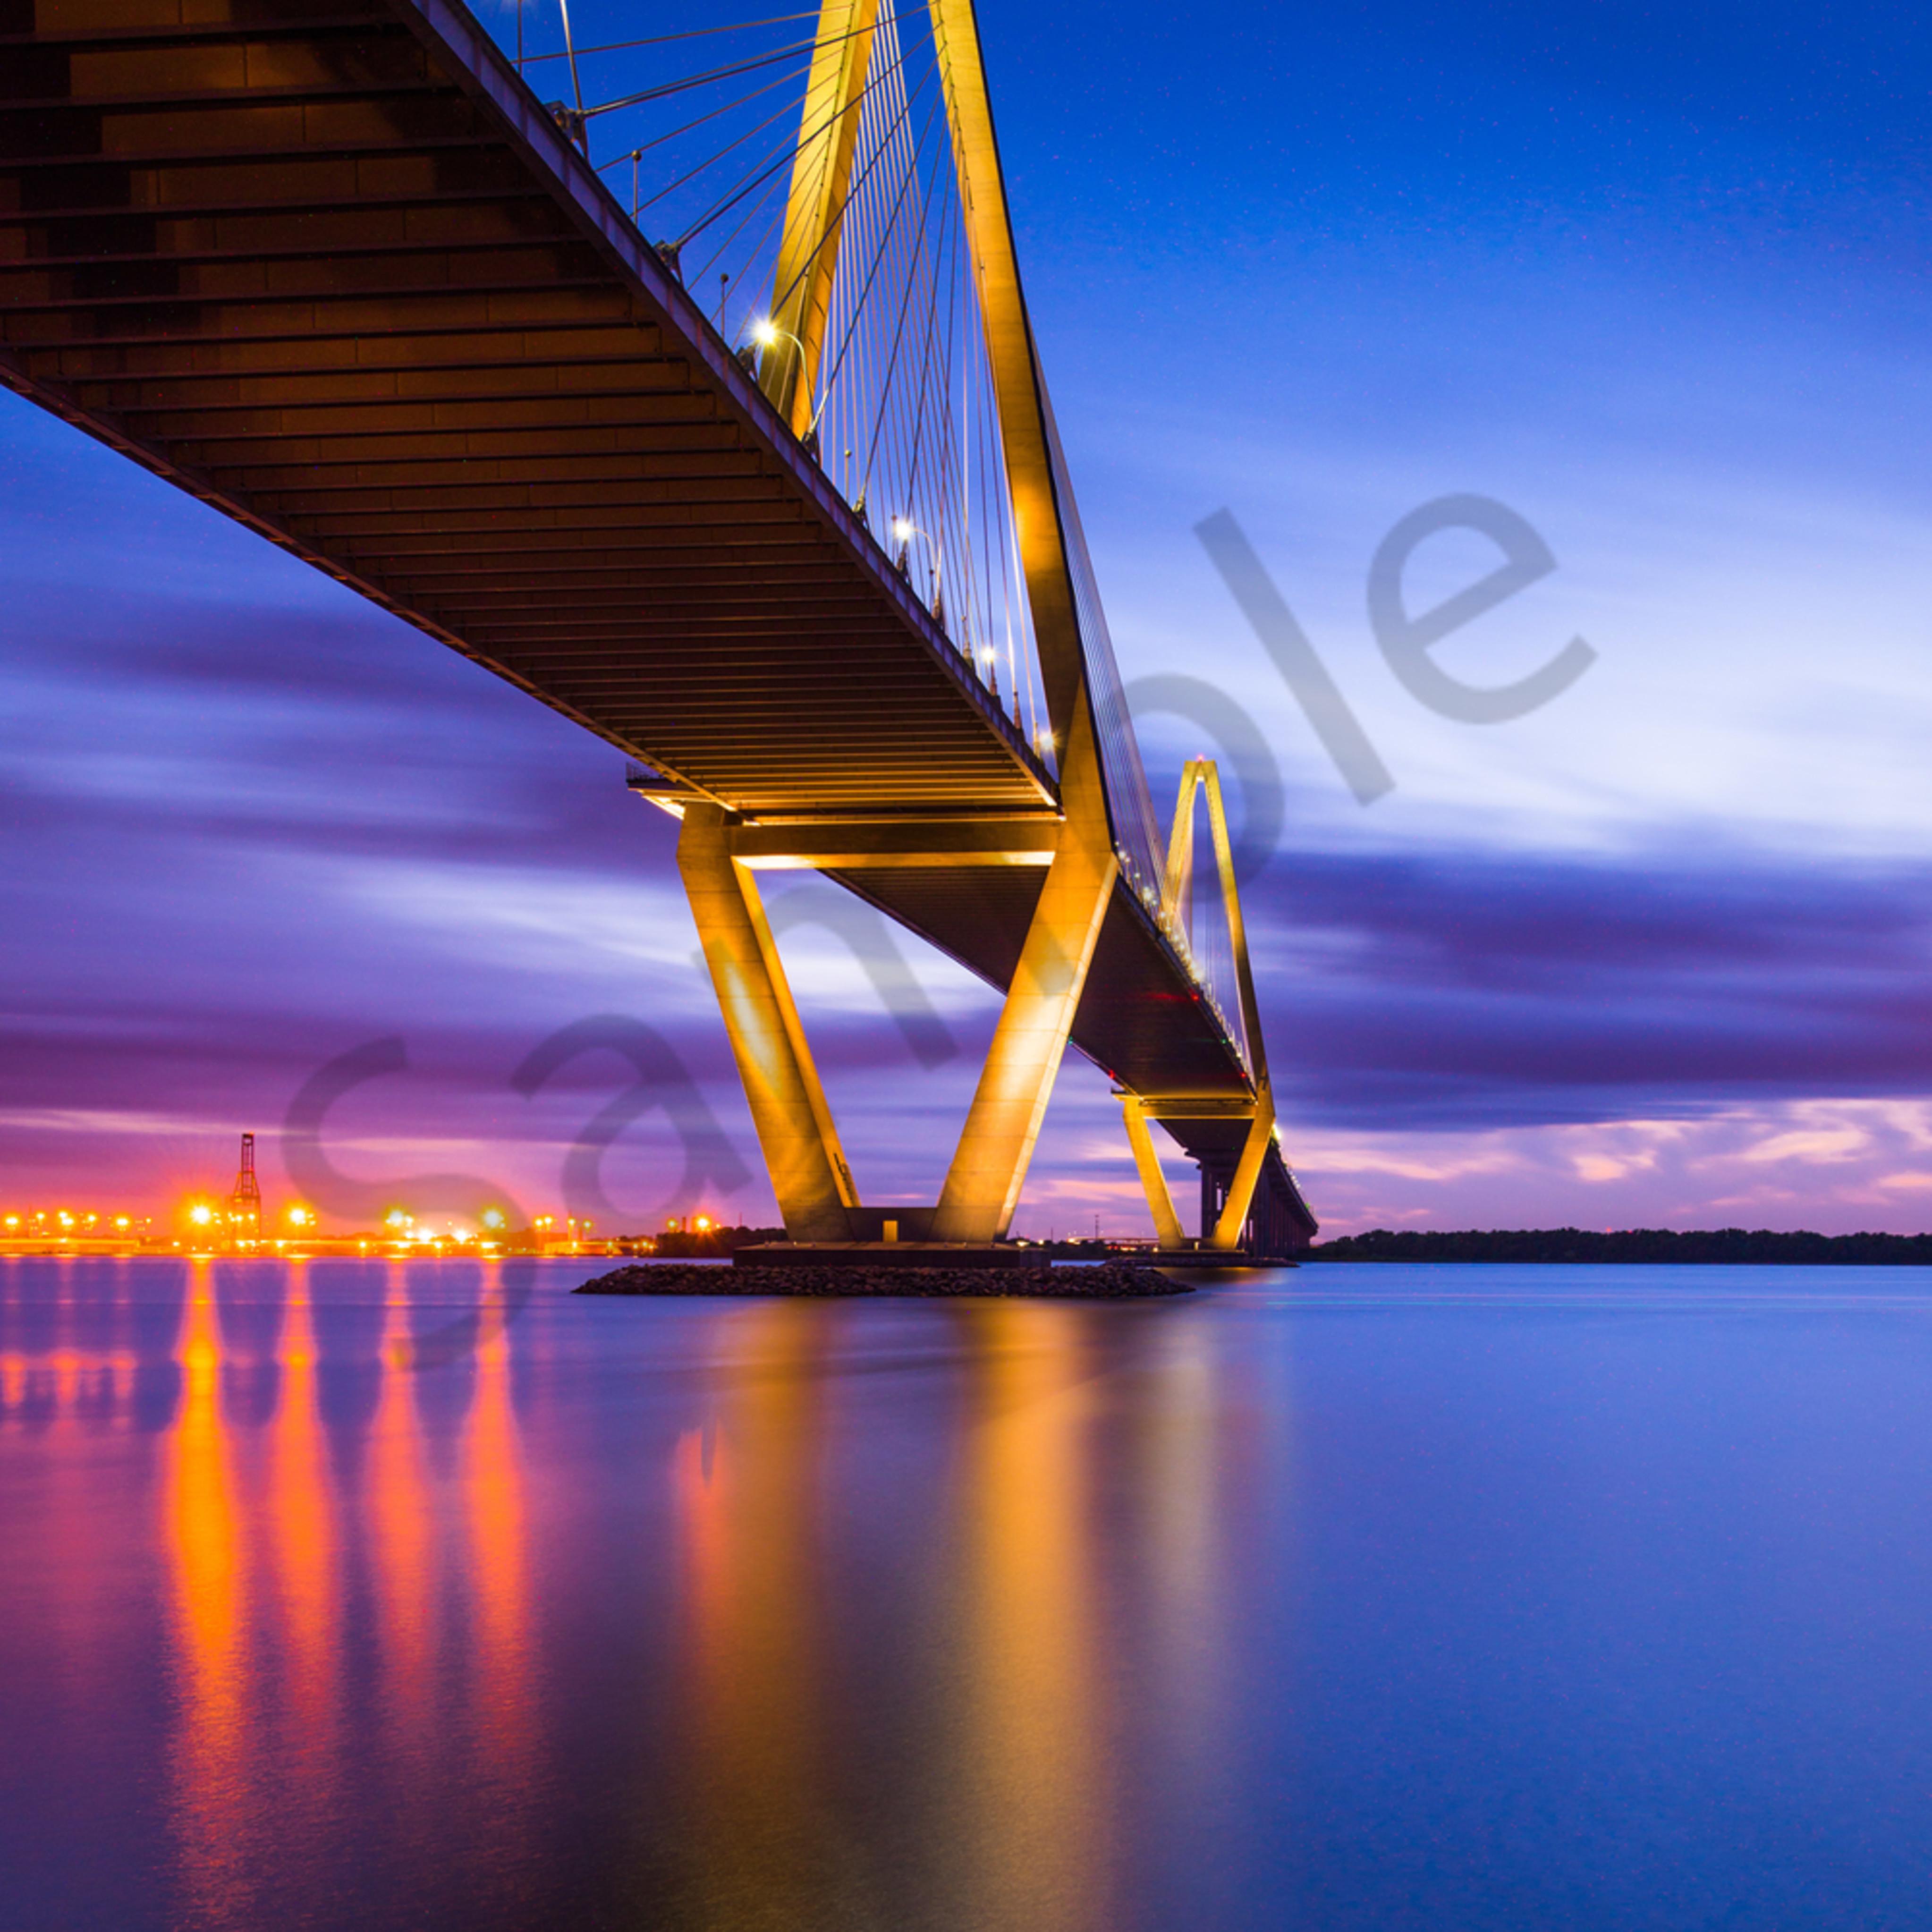 Davidknightphotography ocean beaches sunset atlantic pier 79 ant8w4